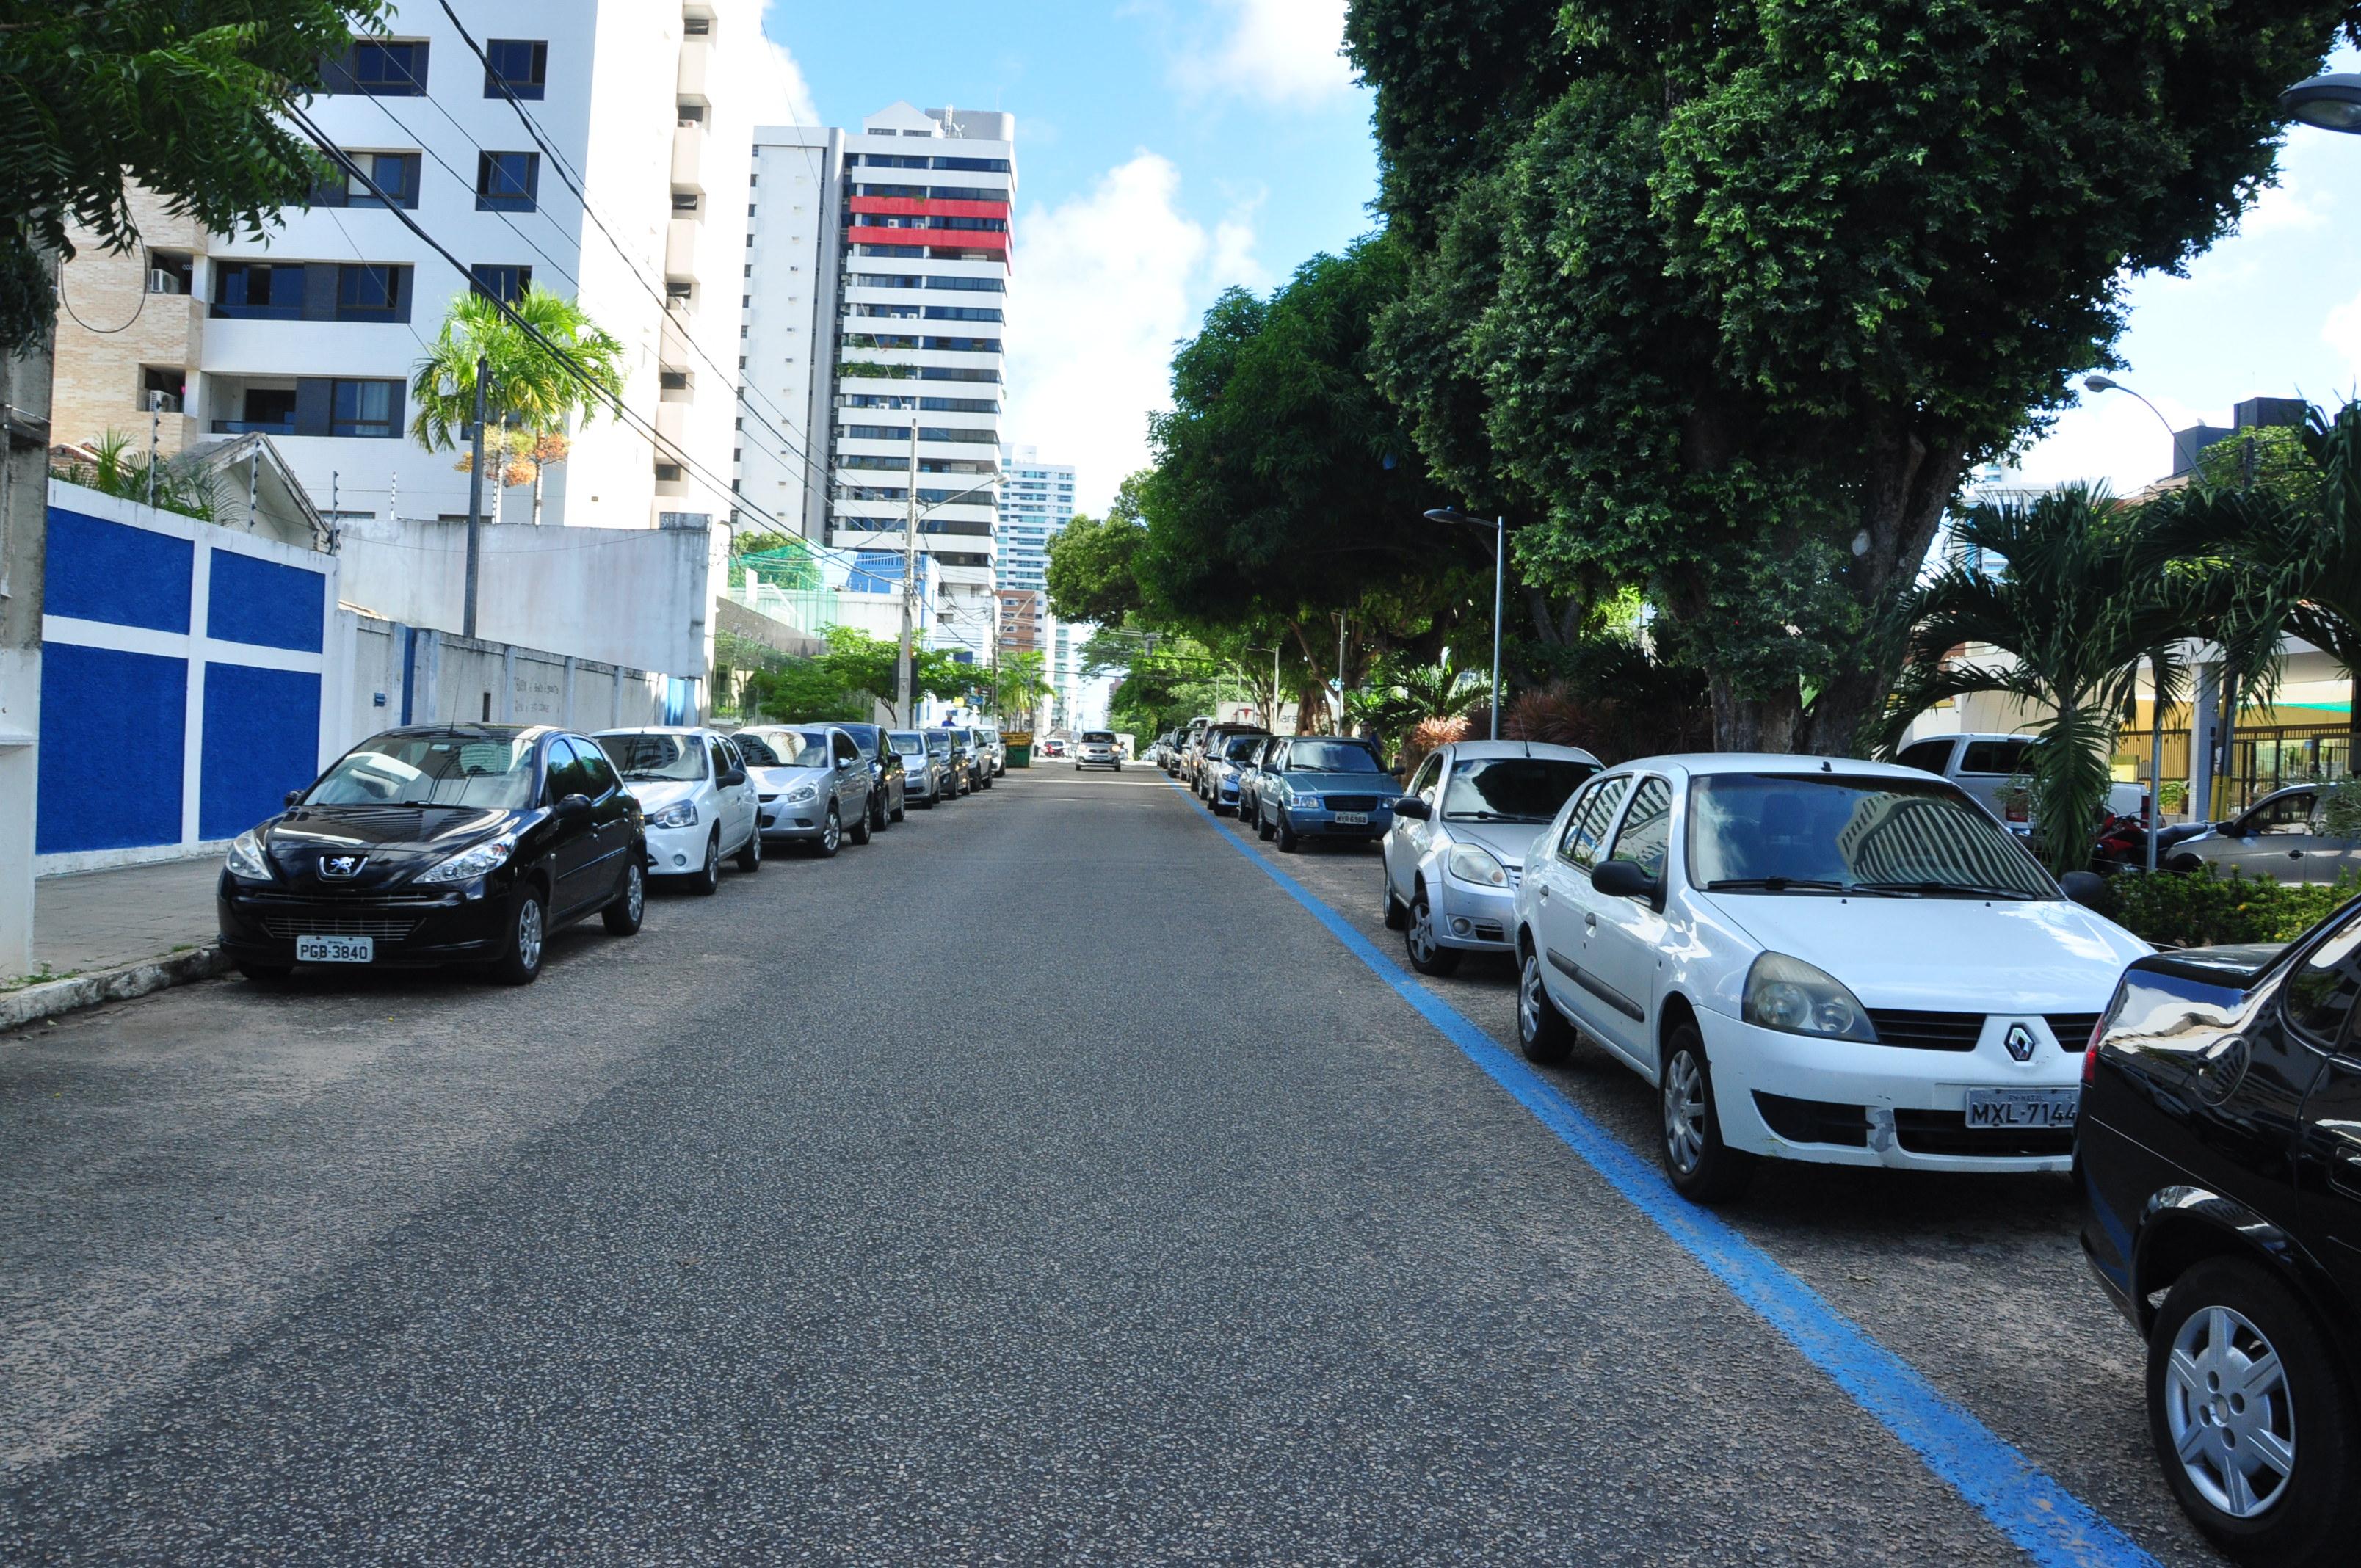 Rua Campos sales Petropólis 6